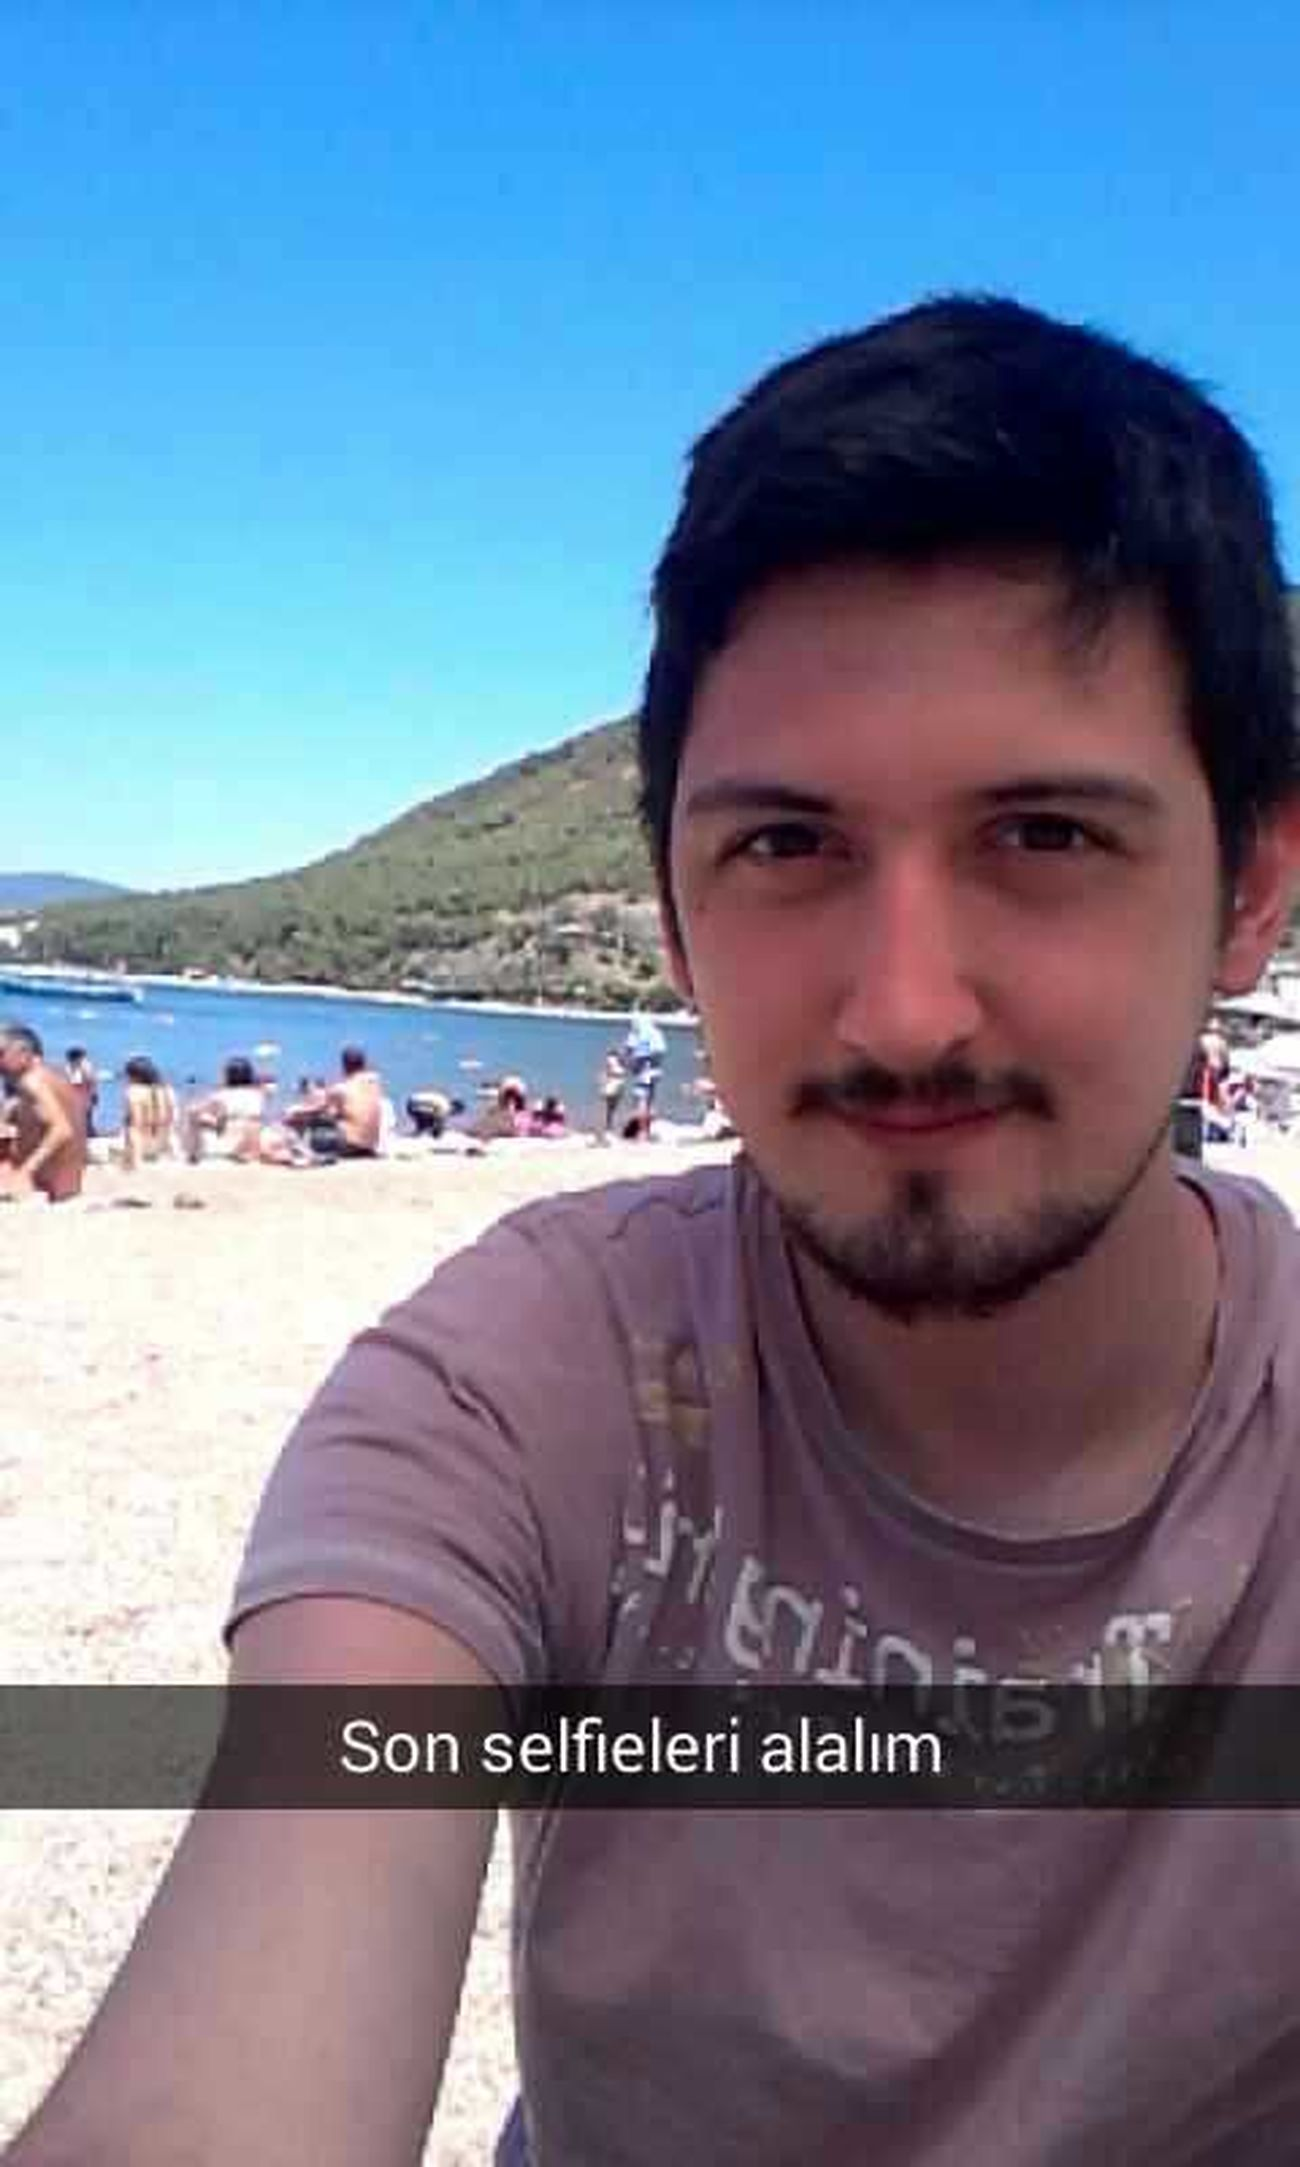 Selfie That's Me Portrait Snapchat: gokeryazici